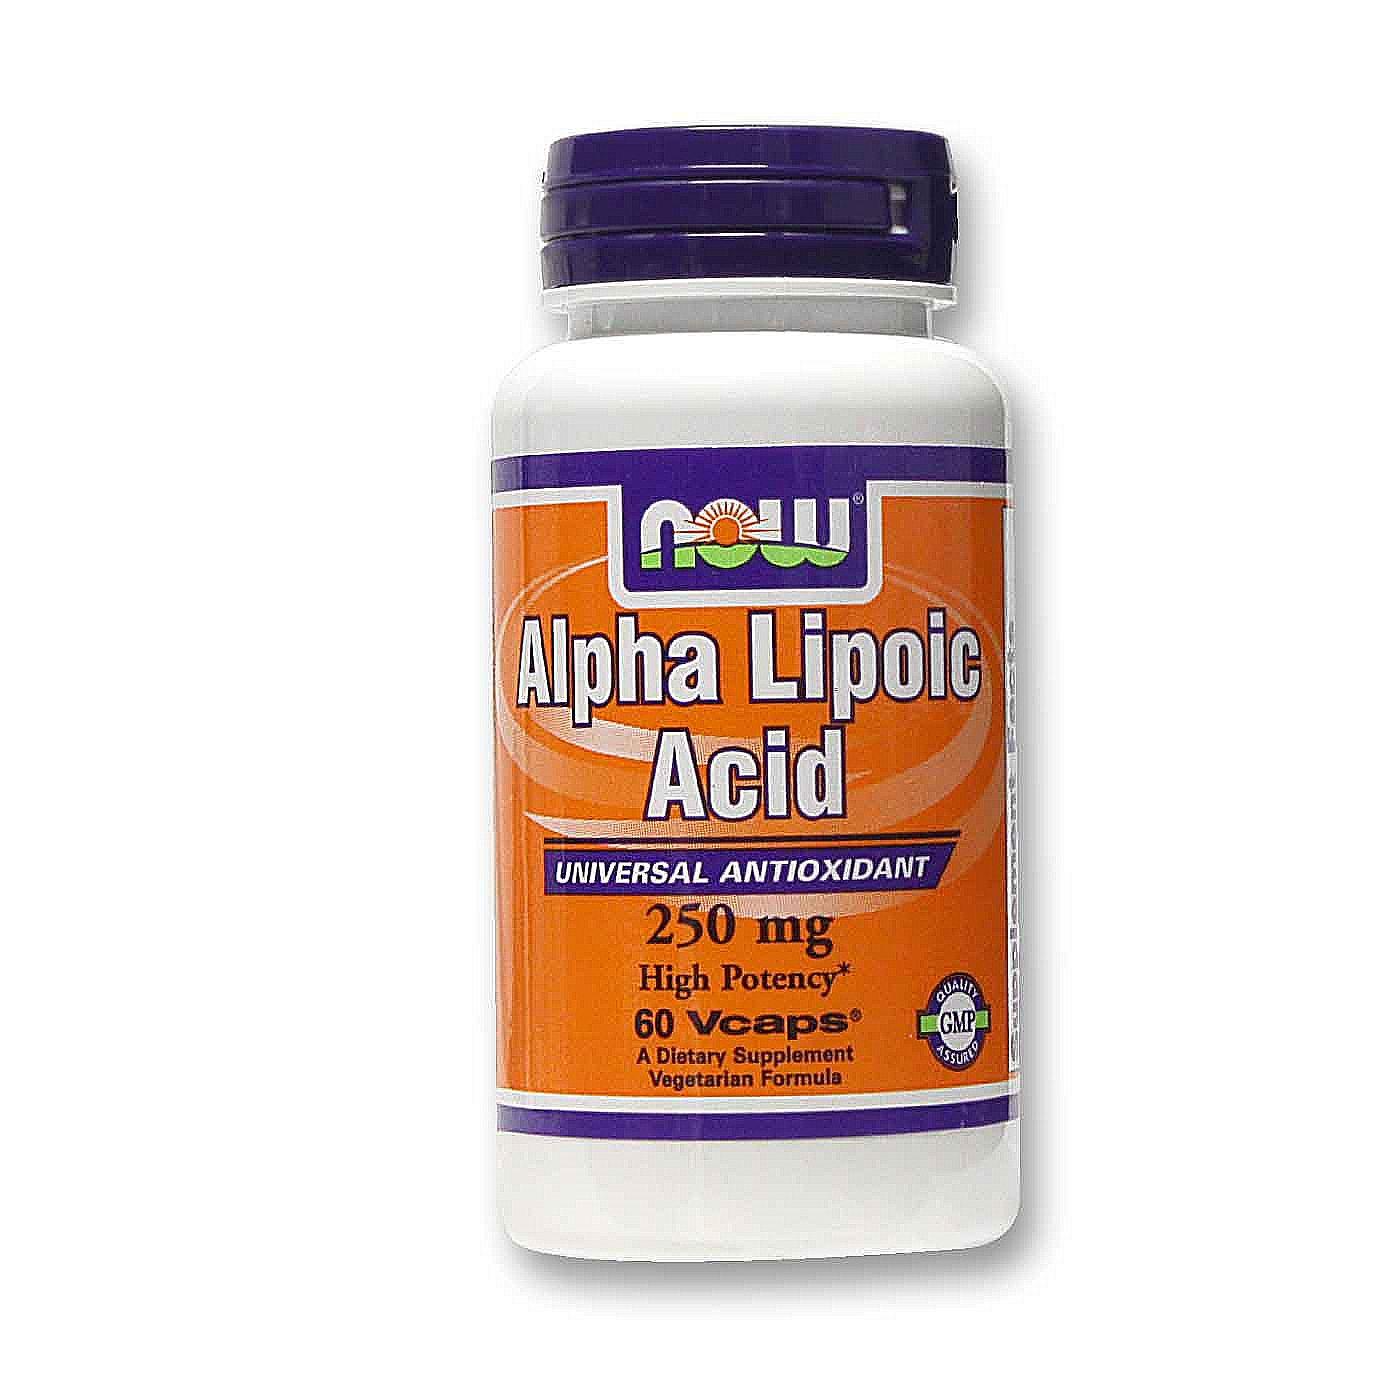 NOW Foods Alpha Lipoic Acid 250 mg